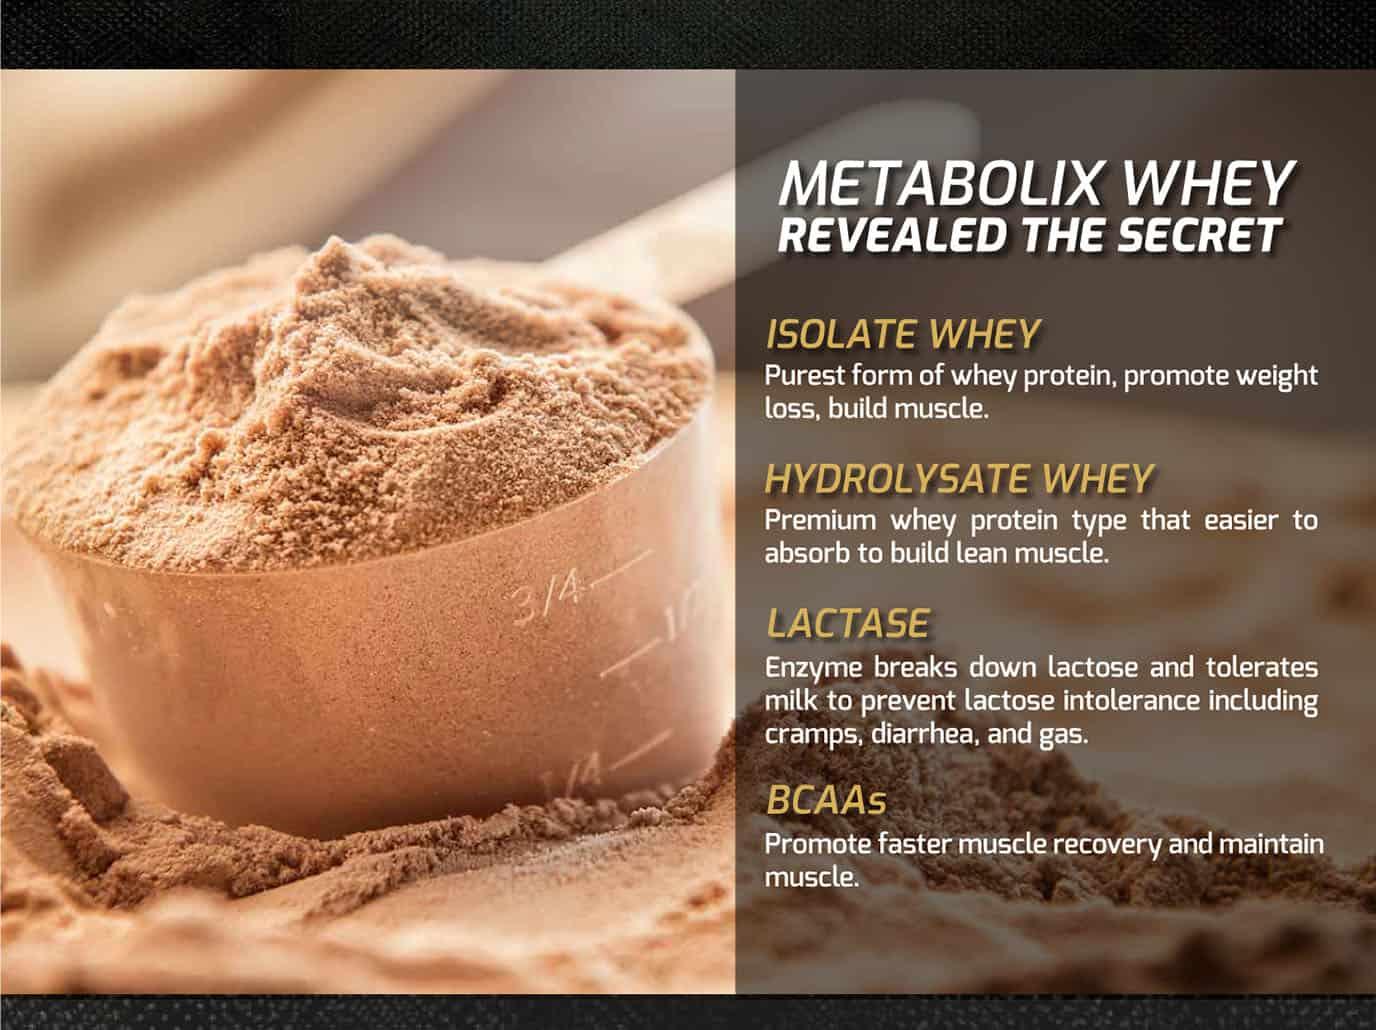 MMX Metabolix Whey Protein, burn fat, kurus, slim, thin, body builder, gym, nutrition pro, supplement, sihat, improve energy, gymnast, cyclist, BCAA, kuat tiger, kuasa kuda, amino acid, sado